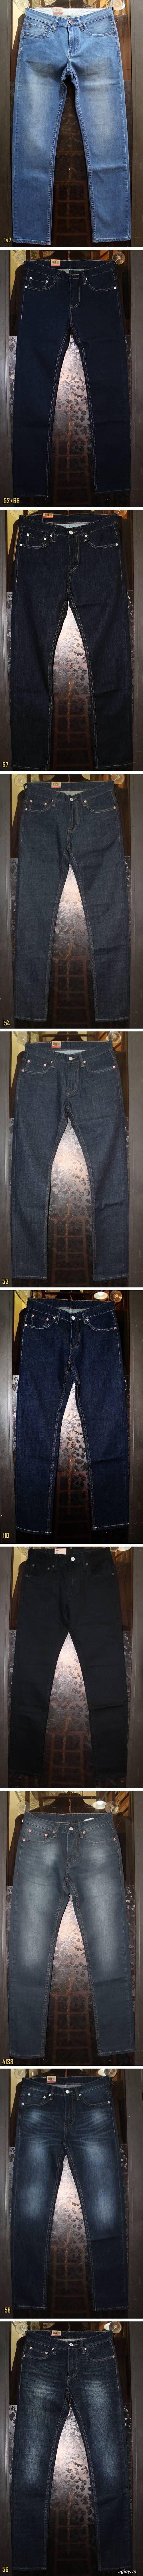 Quần kaki ZARA SlimFit,quần jean Levi's 511 SlimFit,quần short SuperDry,short jean CK - 27